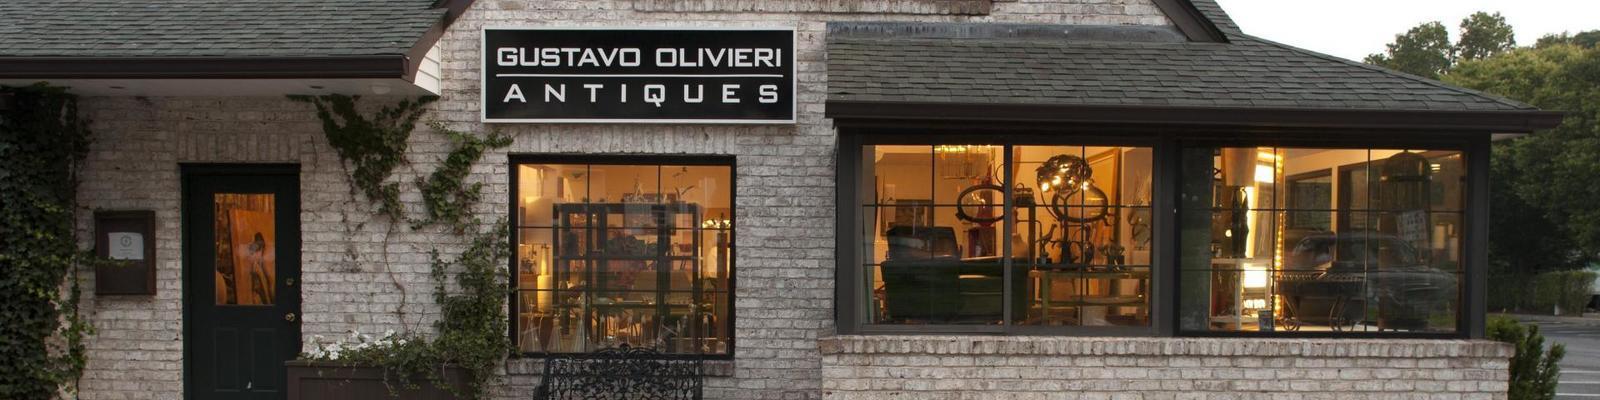 Gustavo Olivieri 20th Century background